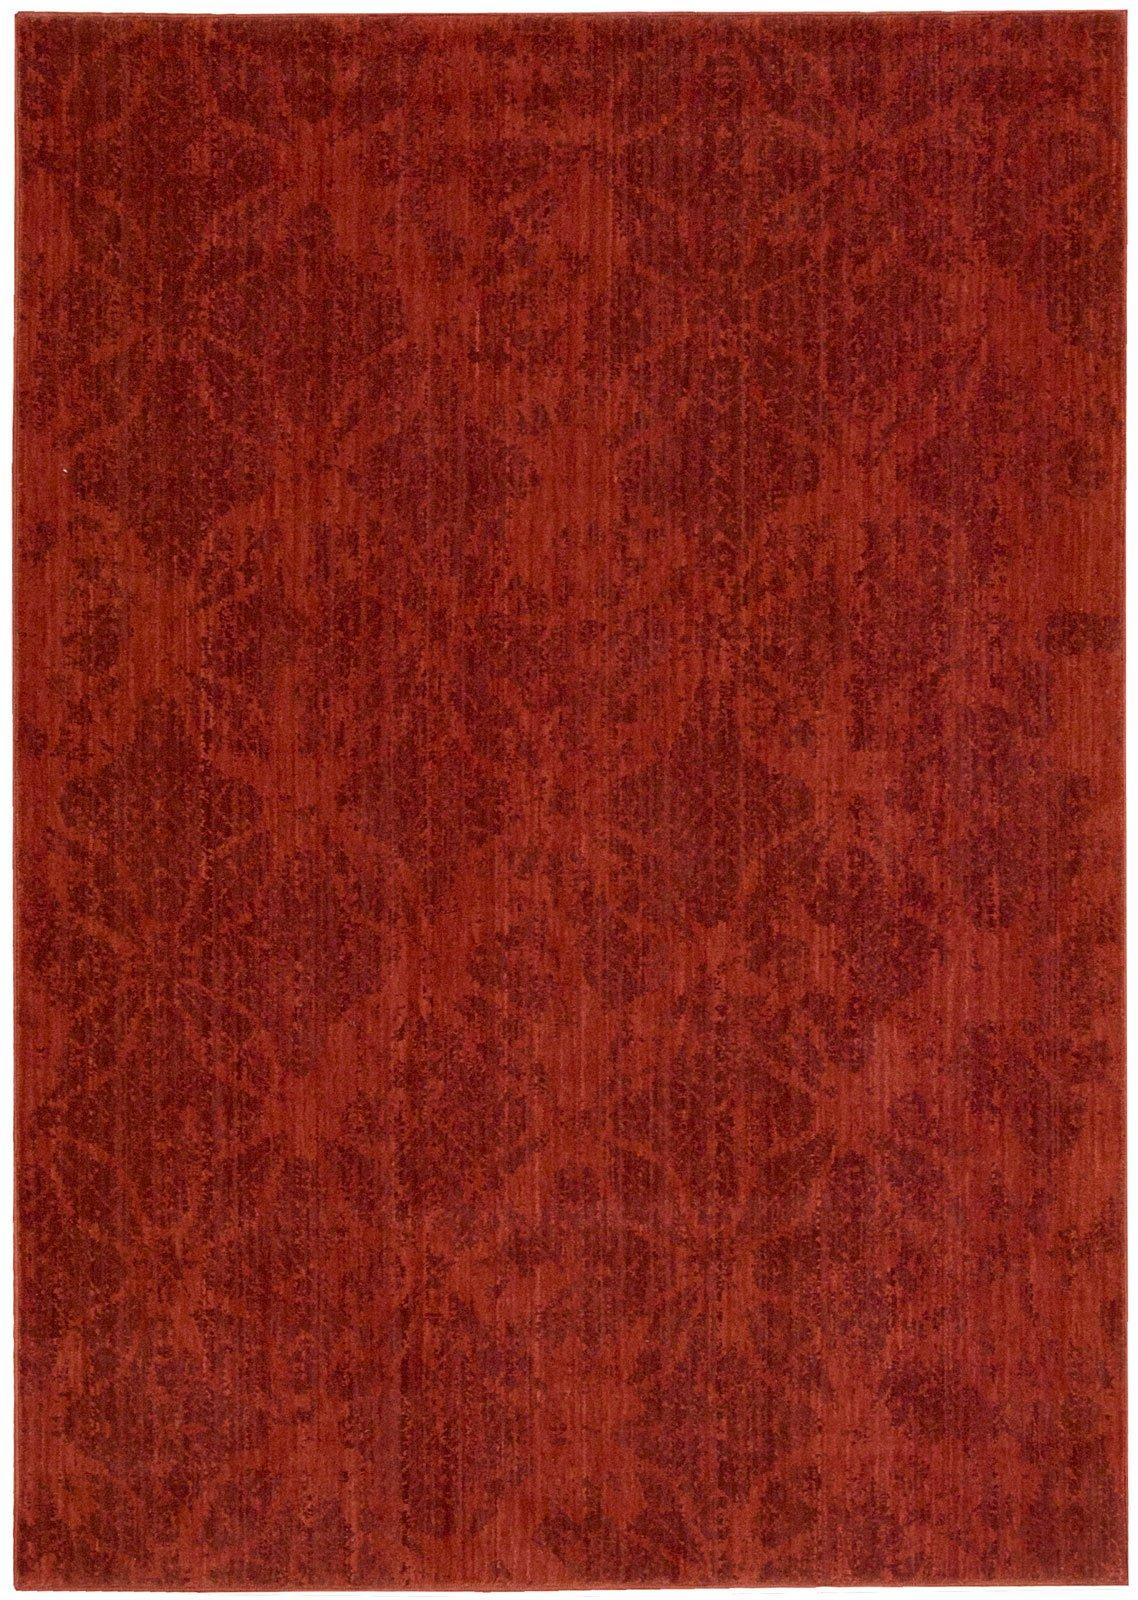 Nuovi tappeti classici new classic o moderni cose di casa - Tappeti immagini ...